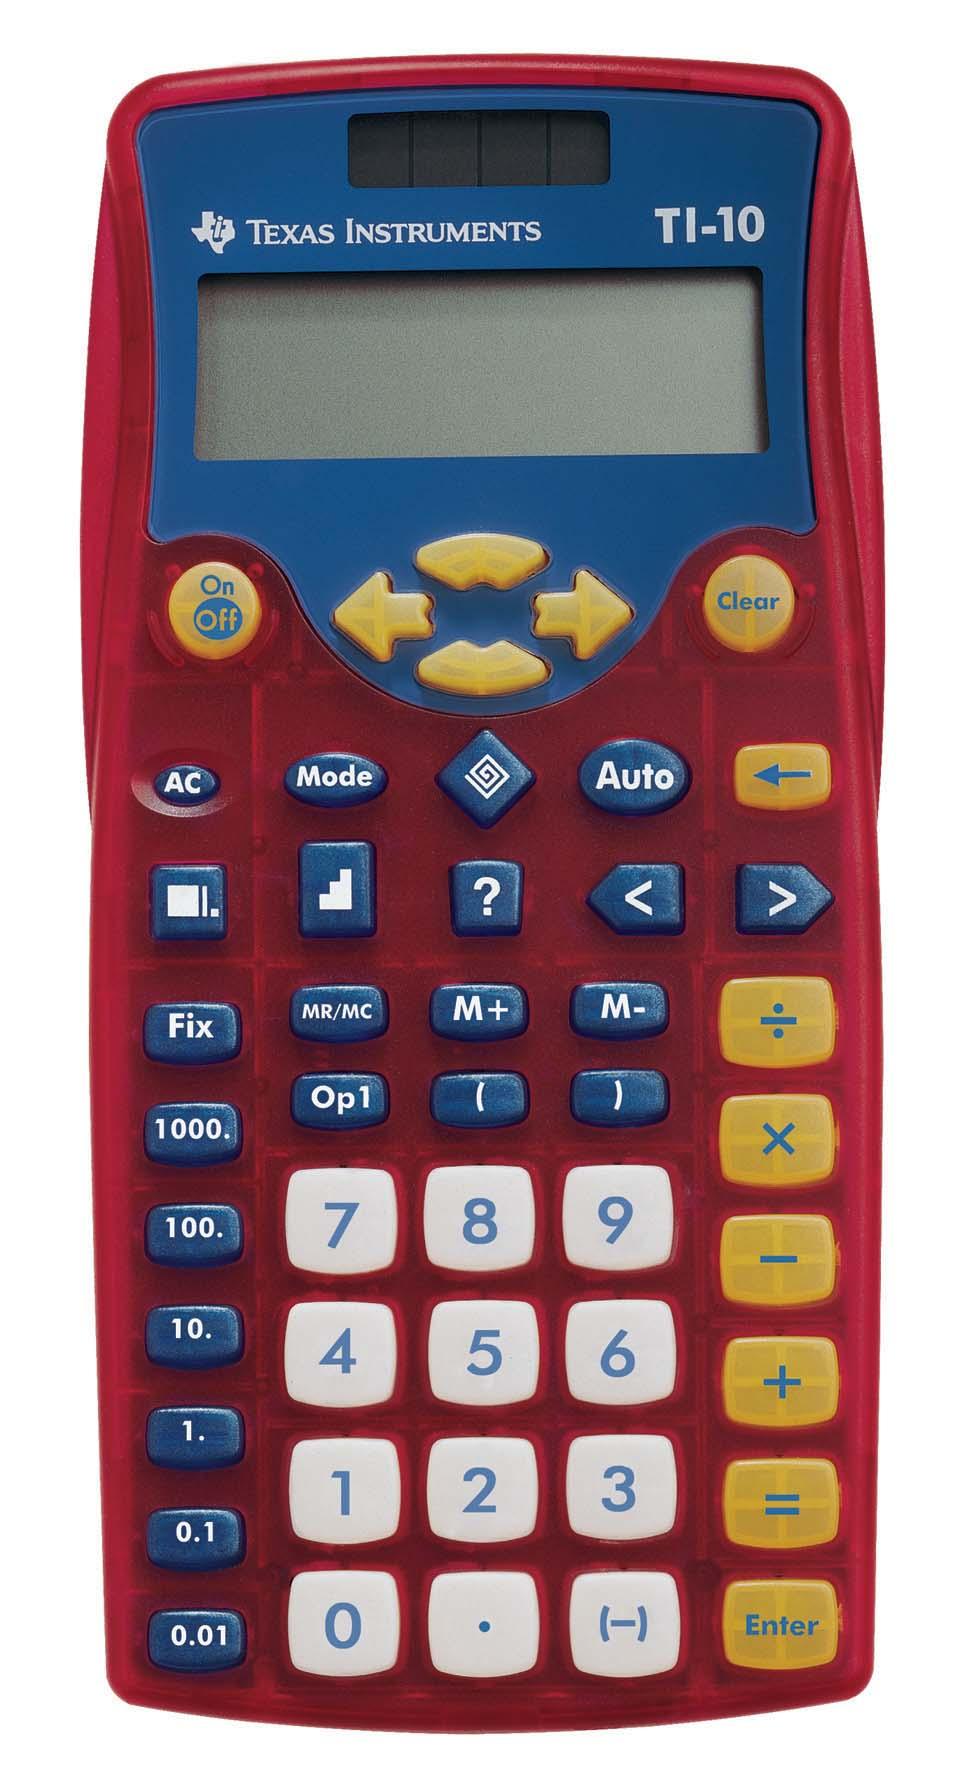 Texas Instruments TI-15 Scientific Calculator